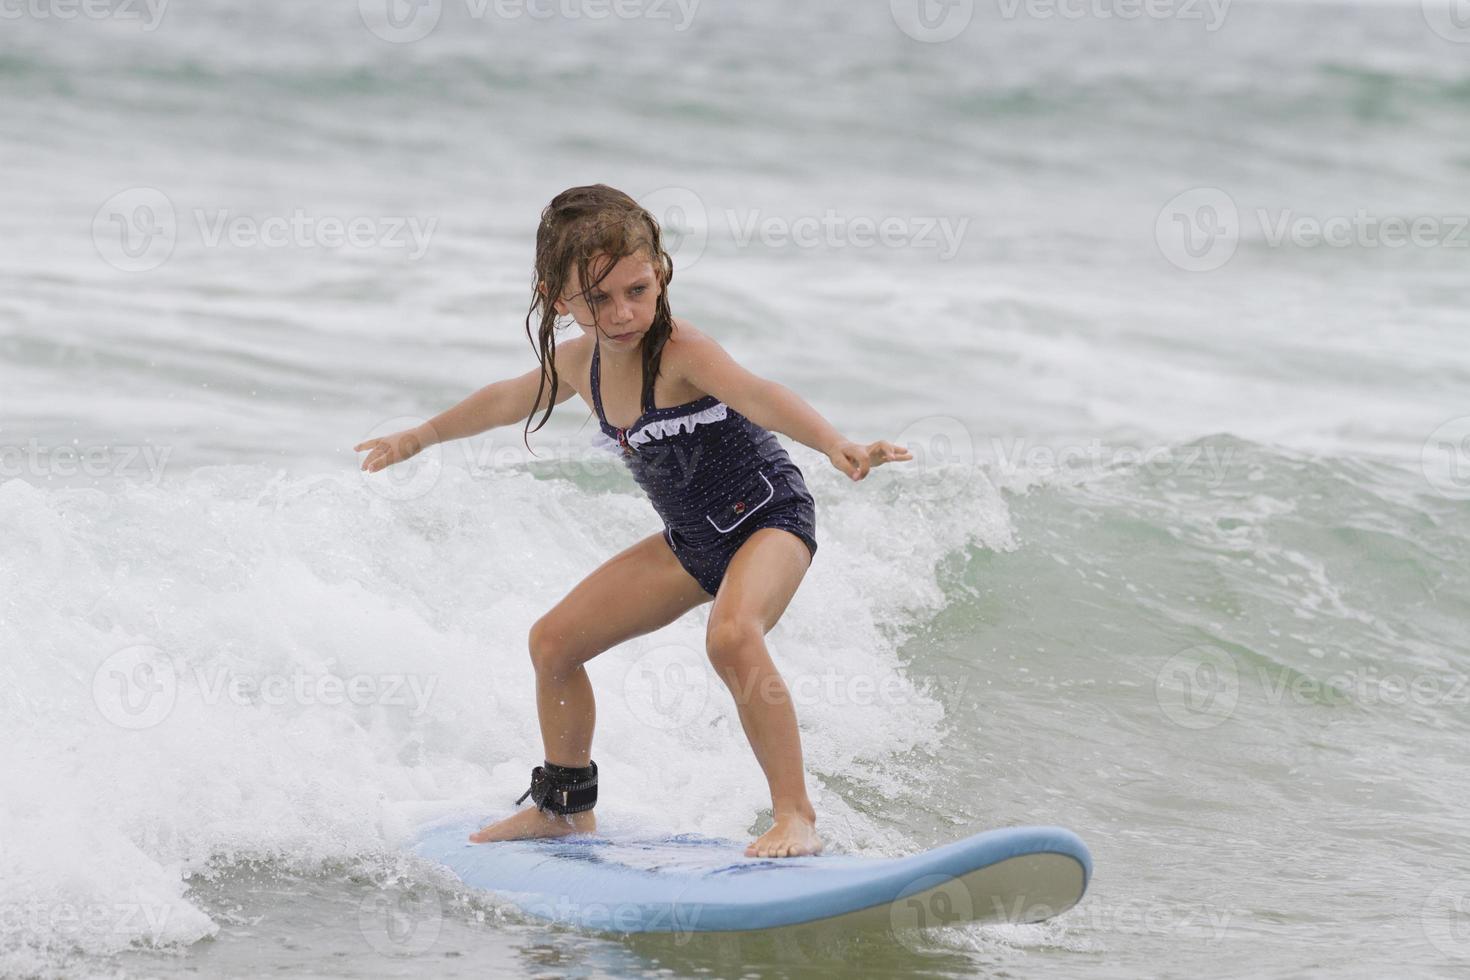 jovem surfando na prancha de surf foto